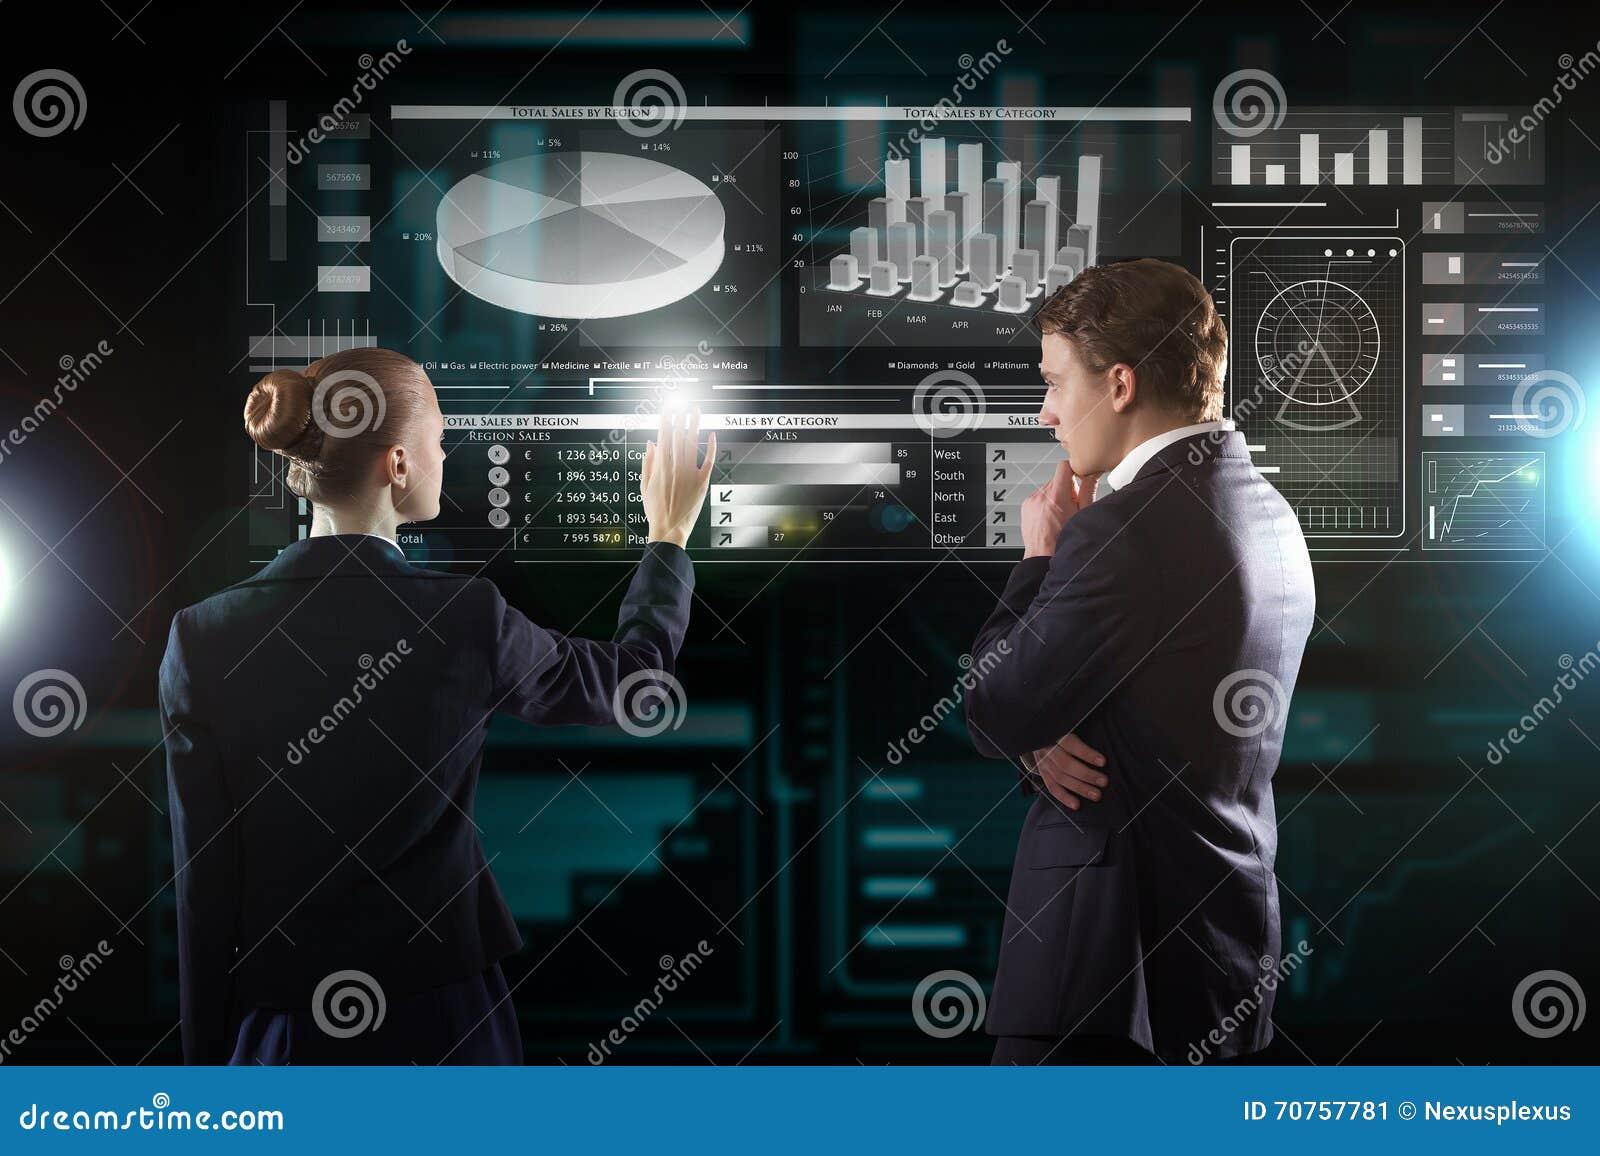 Modern Technology Advantages And Disadvantages